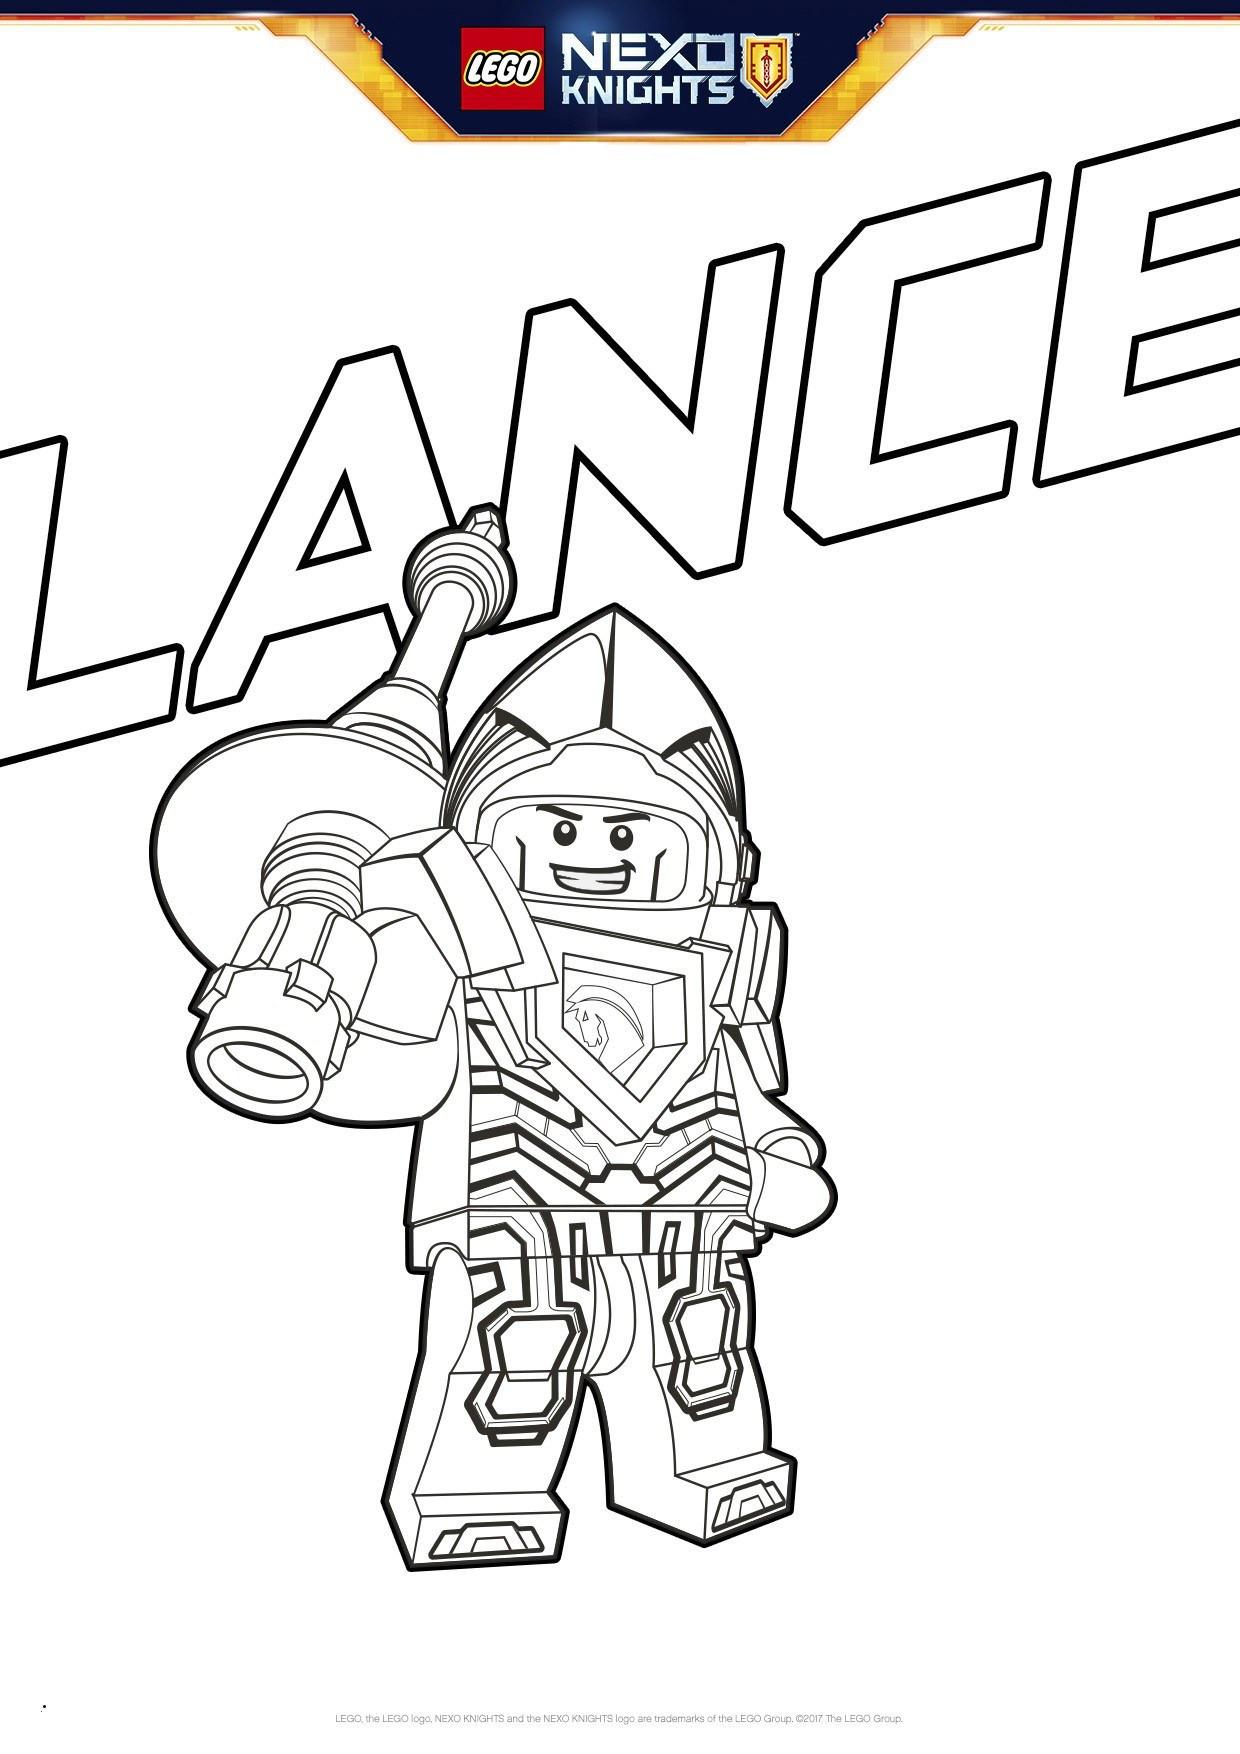 Ausmalbilder Lego Nexo Knights Genial Lego Ausmalbilder Nexo Knights Uploadertalk Genial Ausmalbilder Nexo Bilder